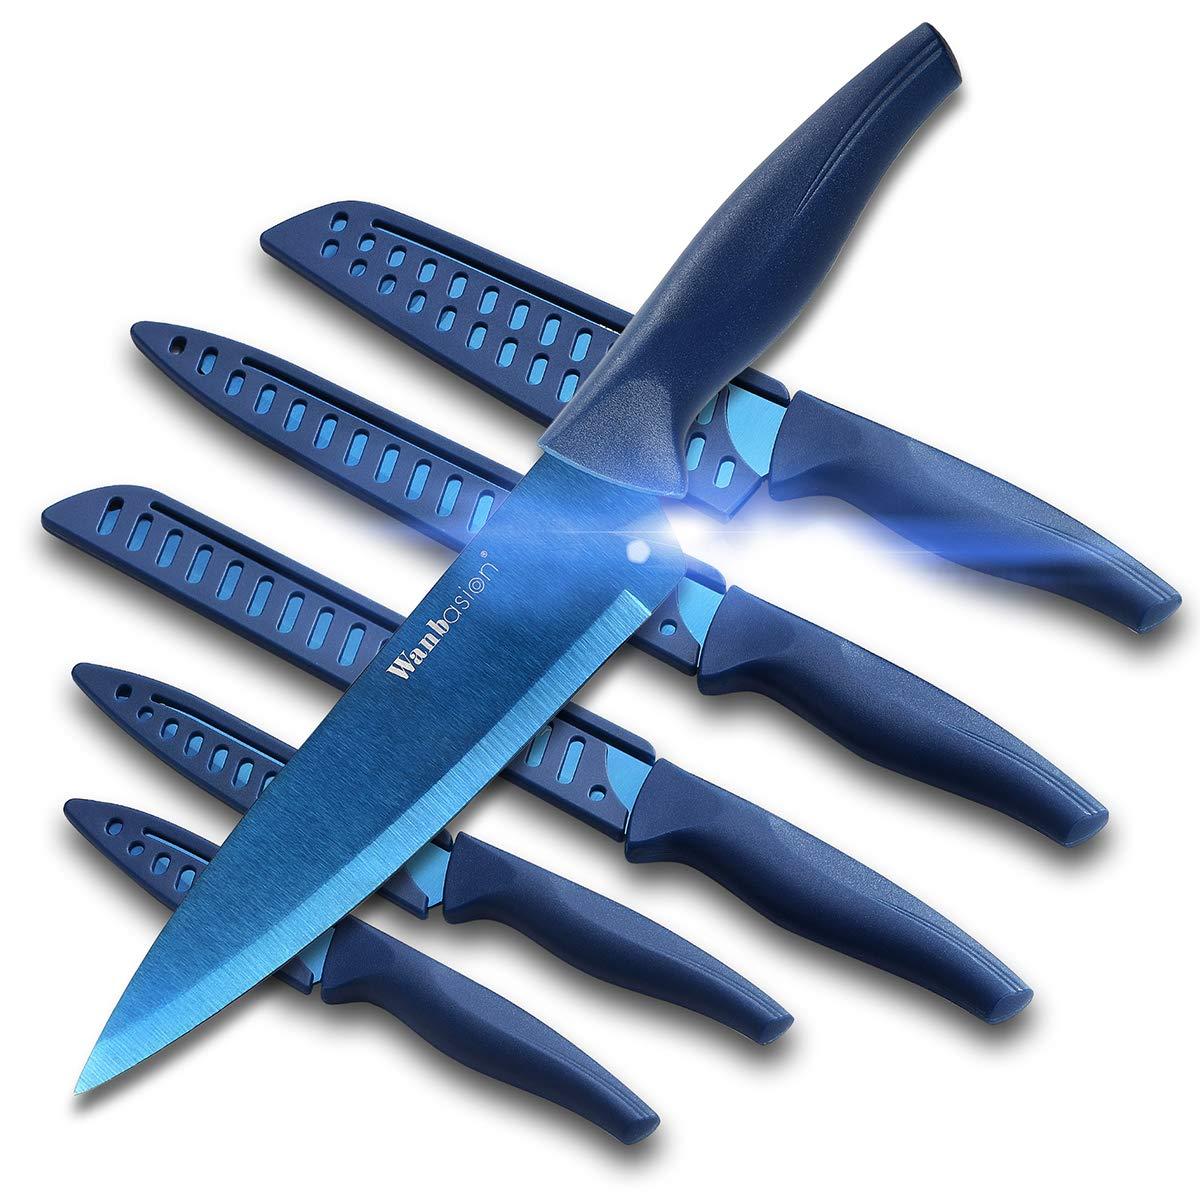 Wanbasion Blue Professional Kitchen Knife Chef Set, Kitchen Knife Set Stainless Steel, Kitchen Knife Set Dishwasher Safe with Sheathes by wanbasion